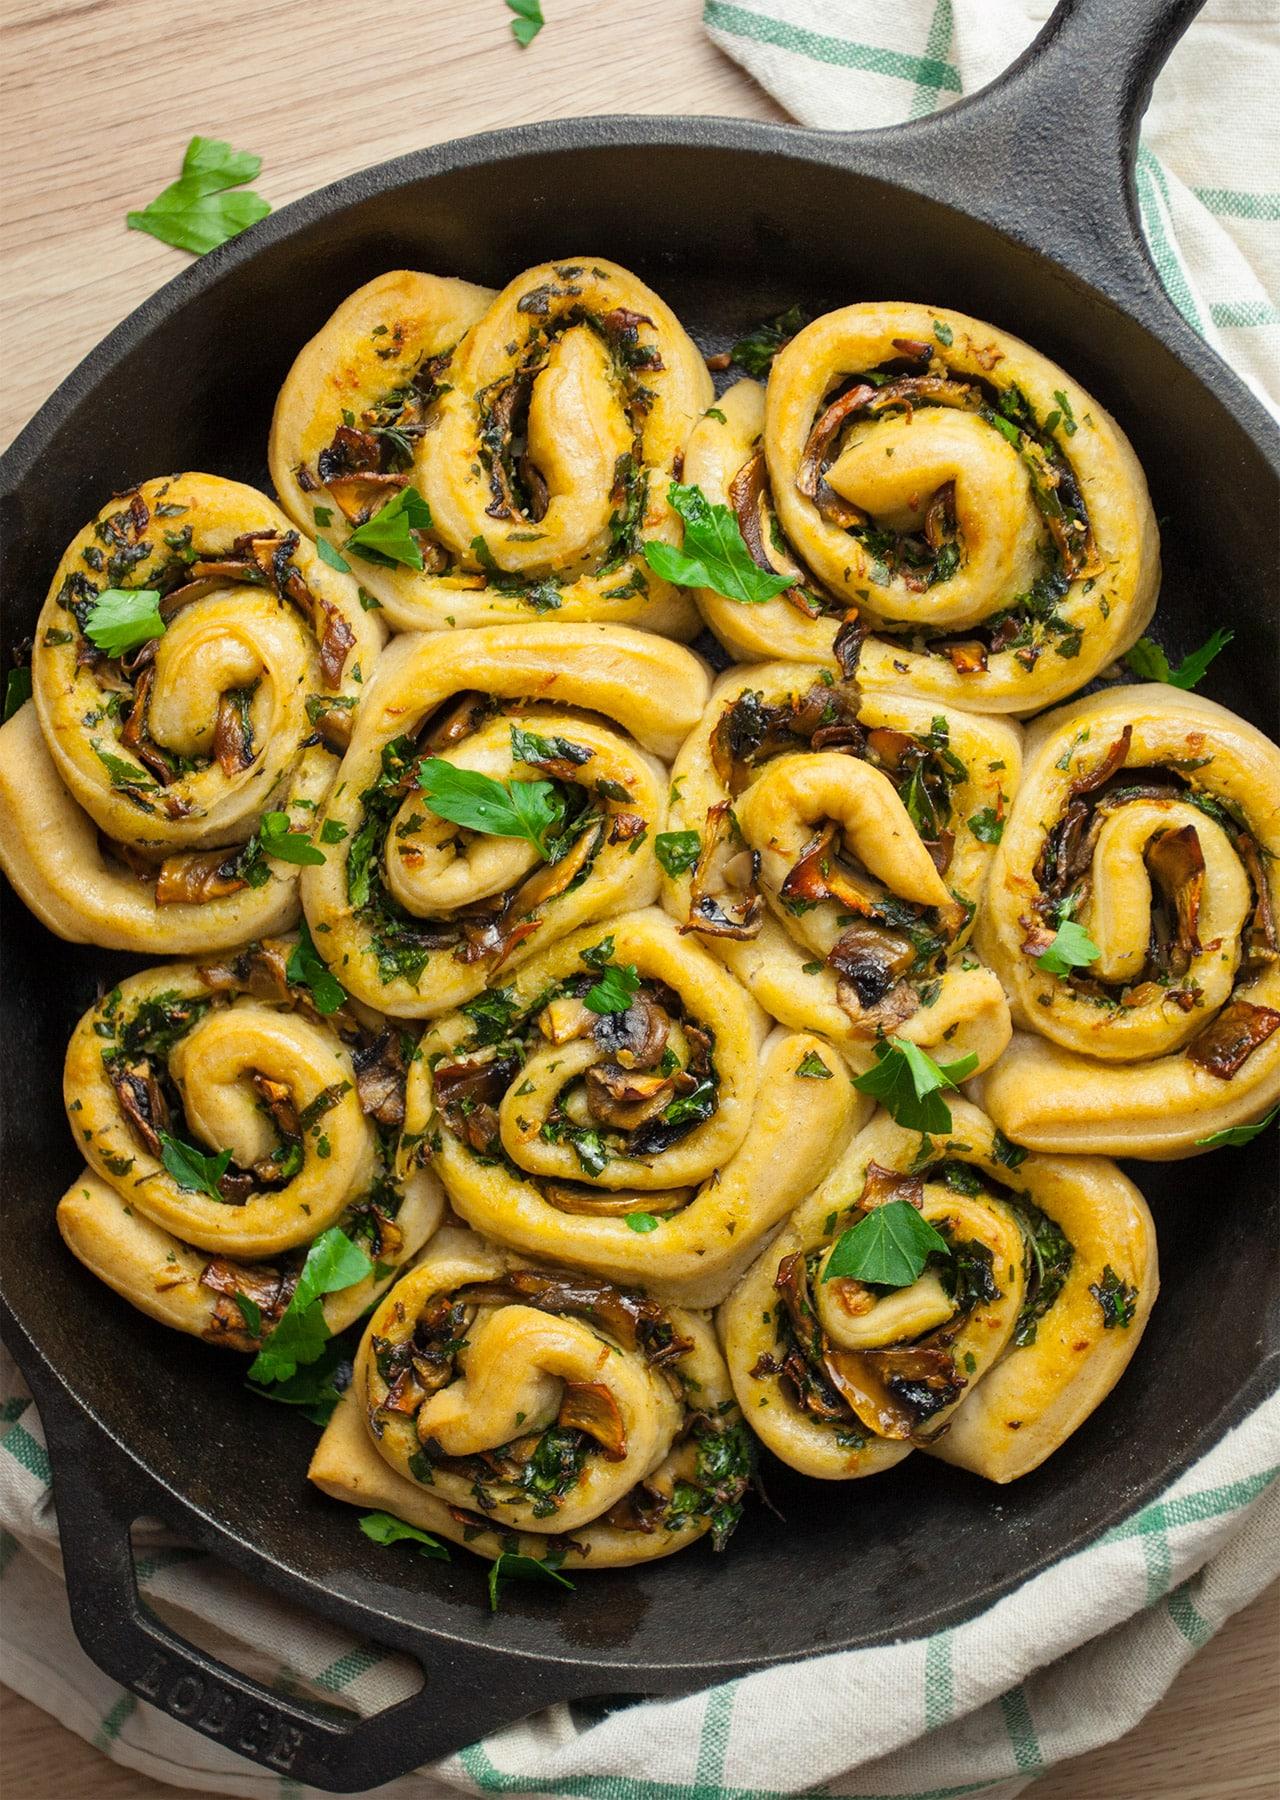 Garlic Bread Swirls